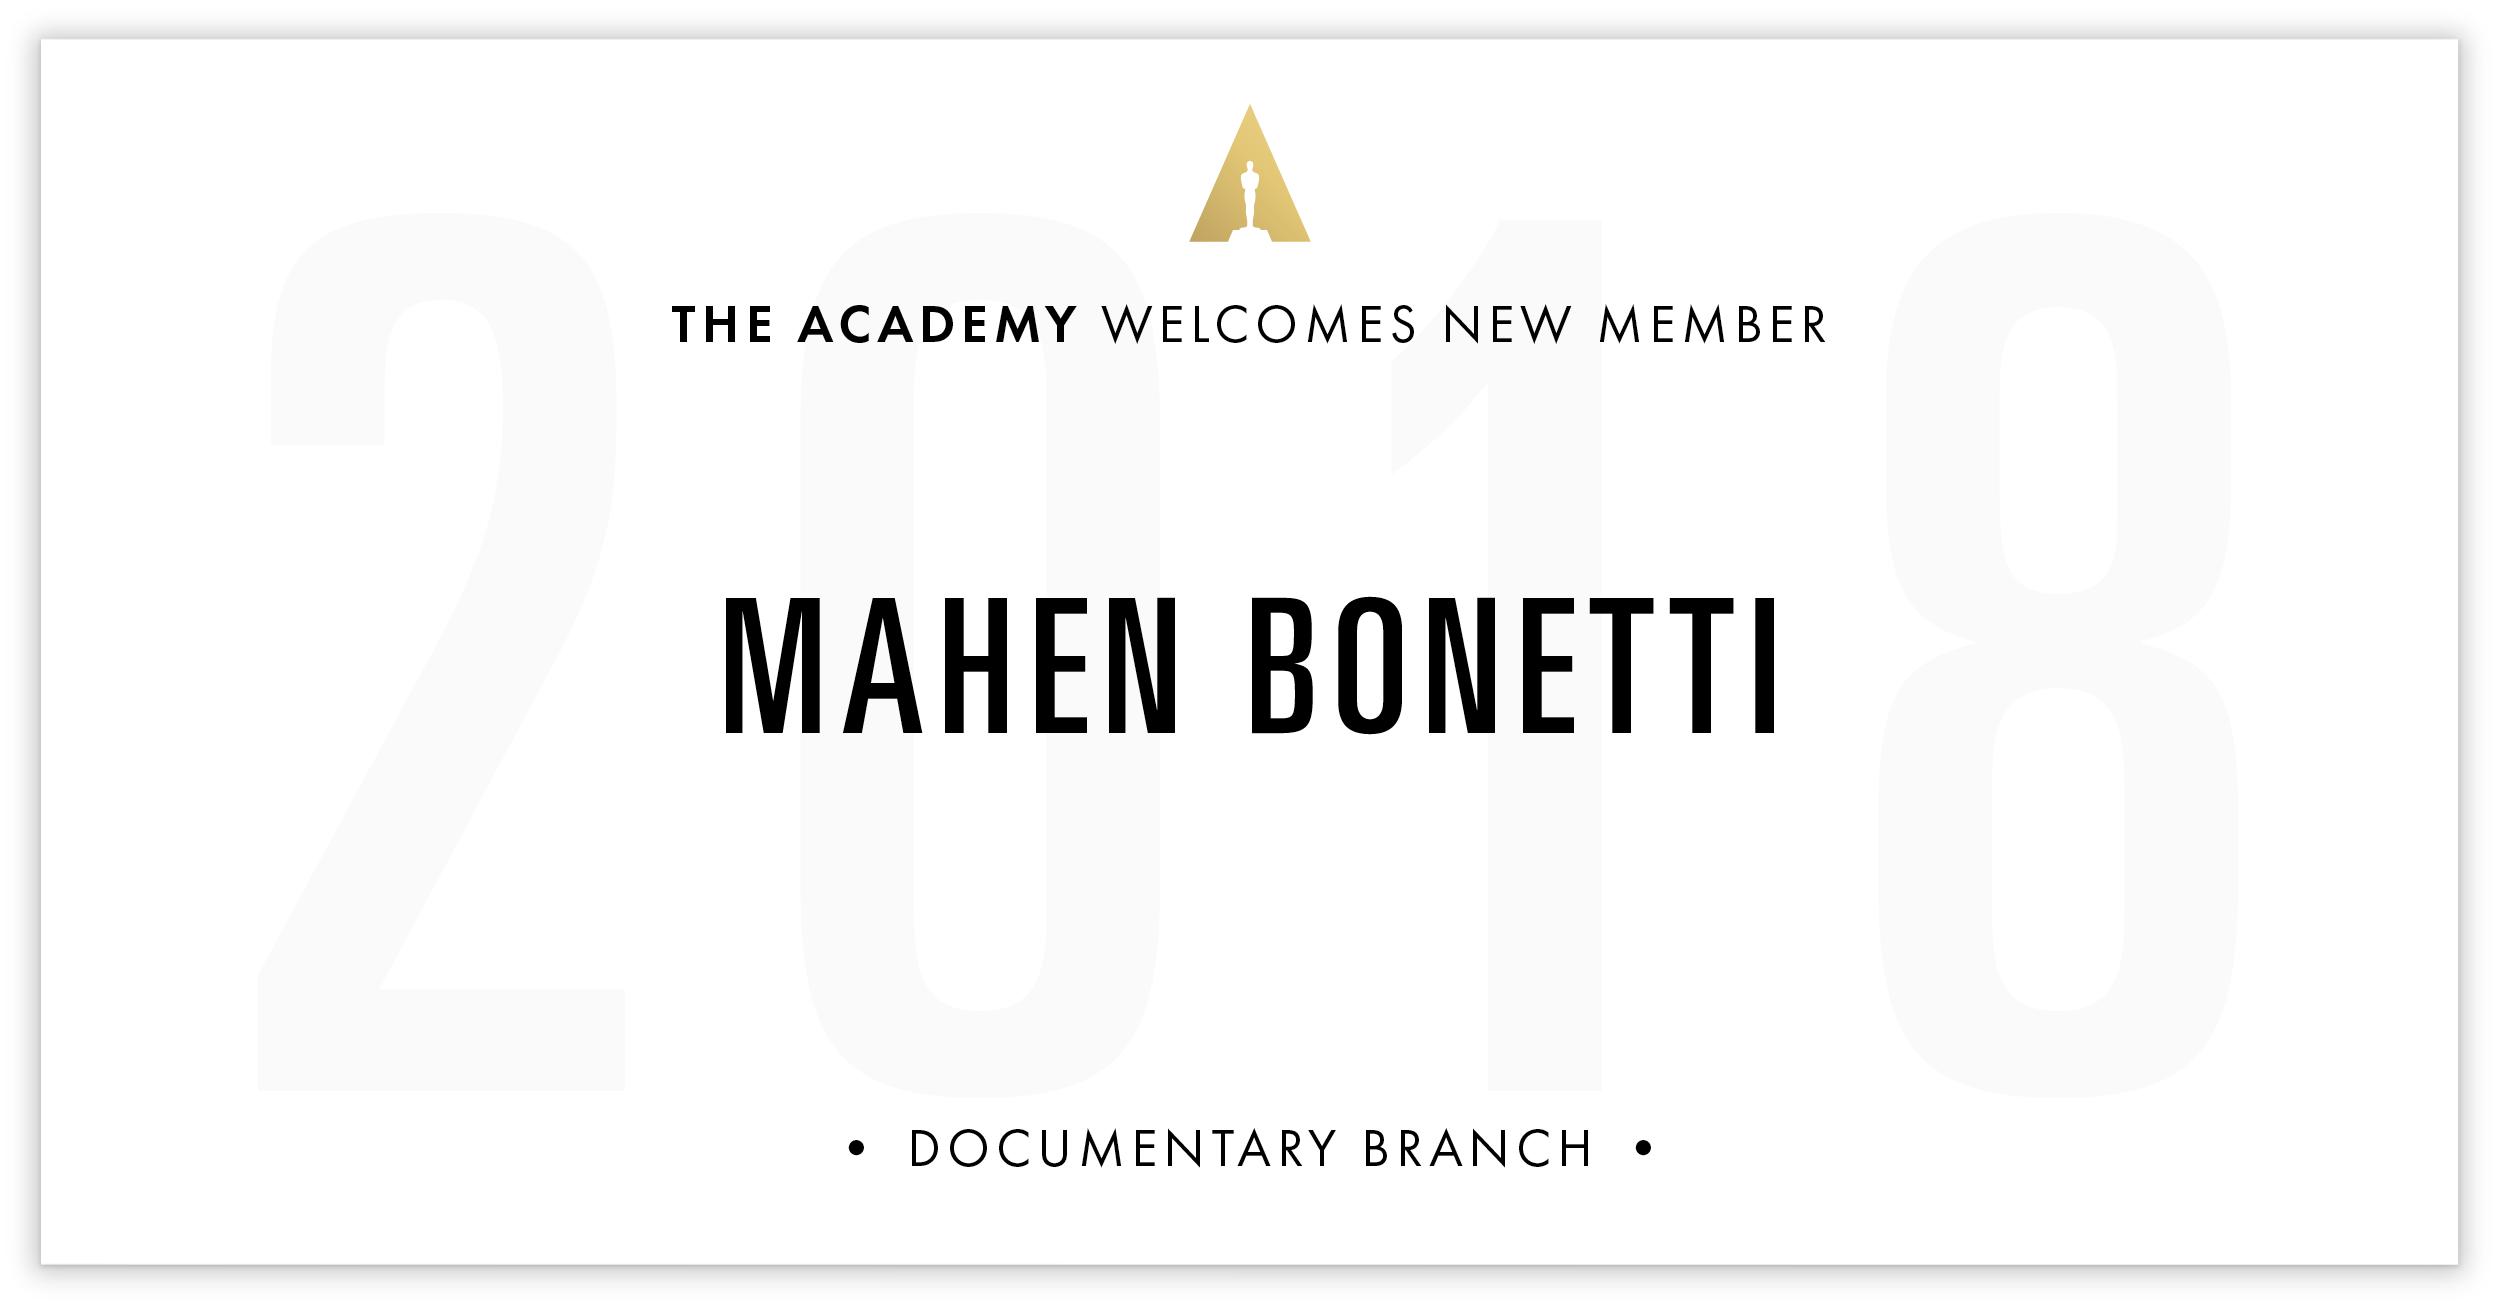 Mahen Bonetti is invited!